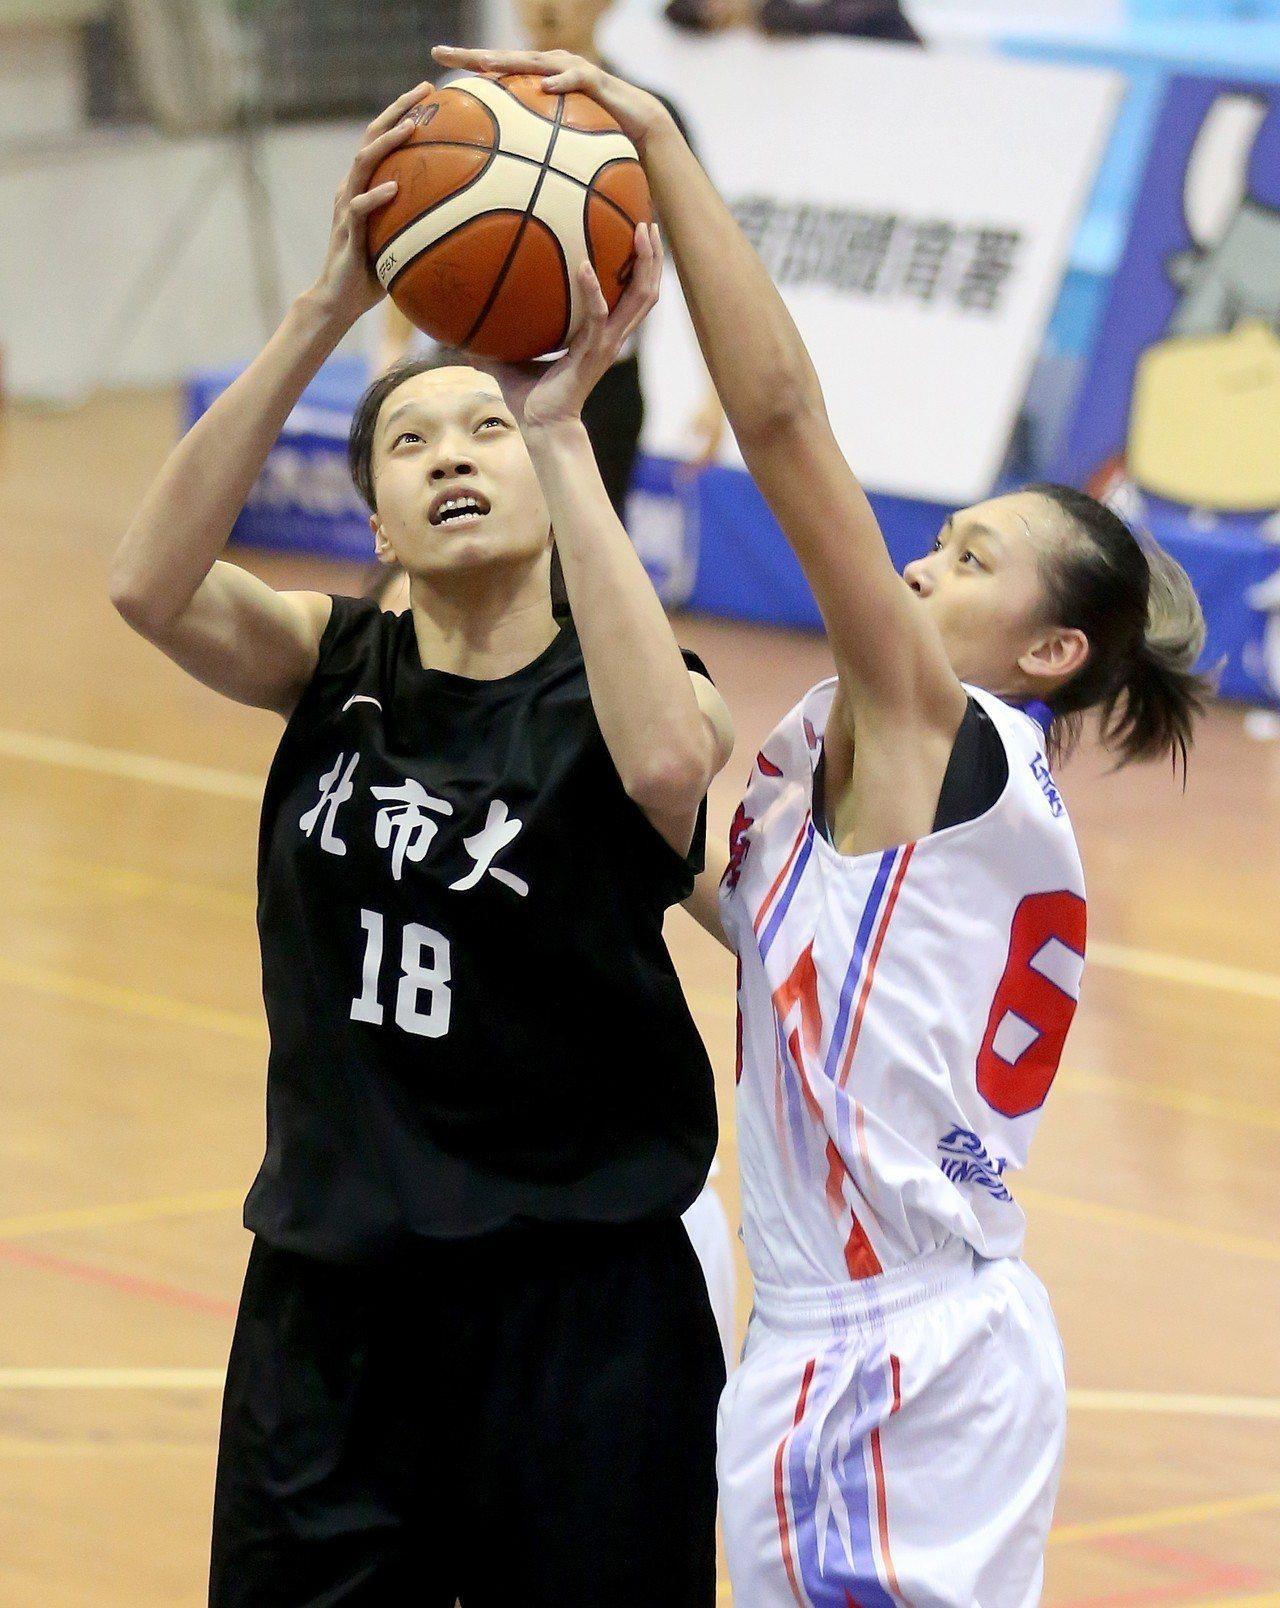 UBA大專籃球聯賽在台灣科大進行女子組賽事,北市大學史靜茹(左)出手時遭東南科大...